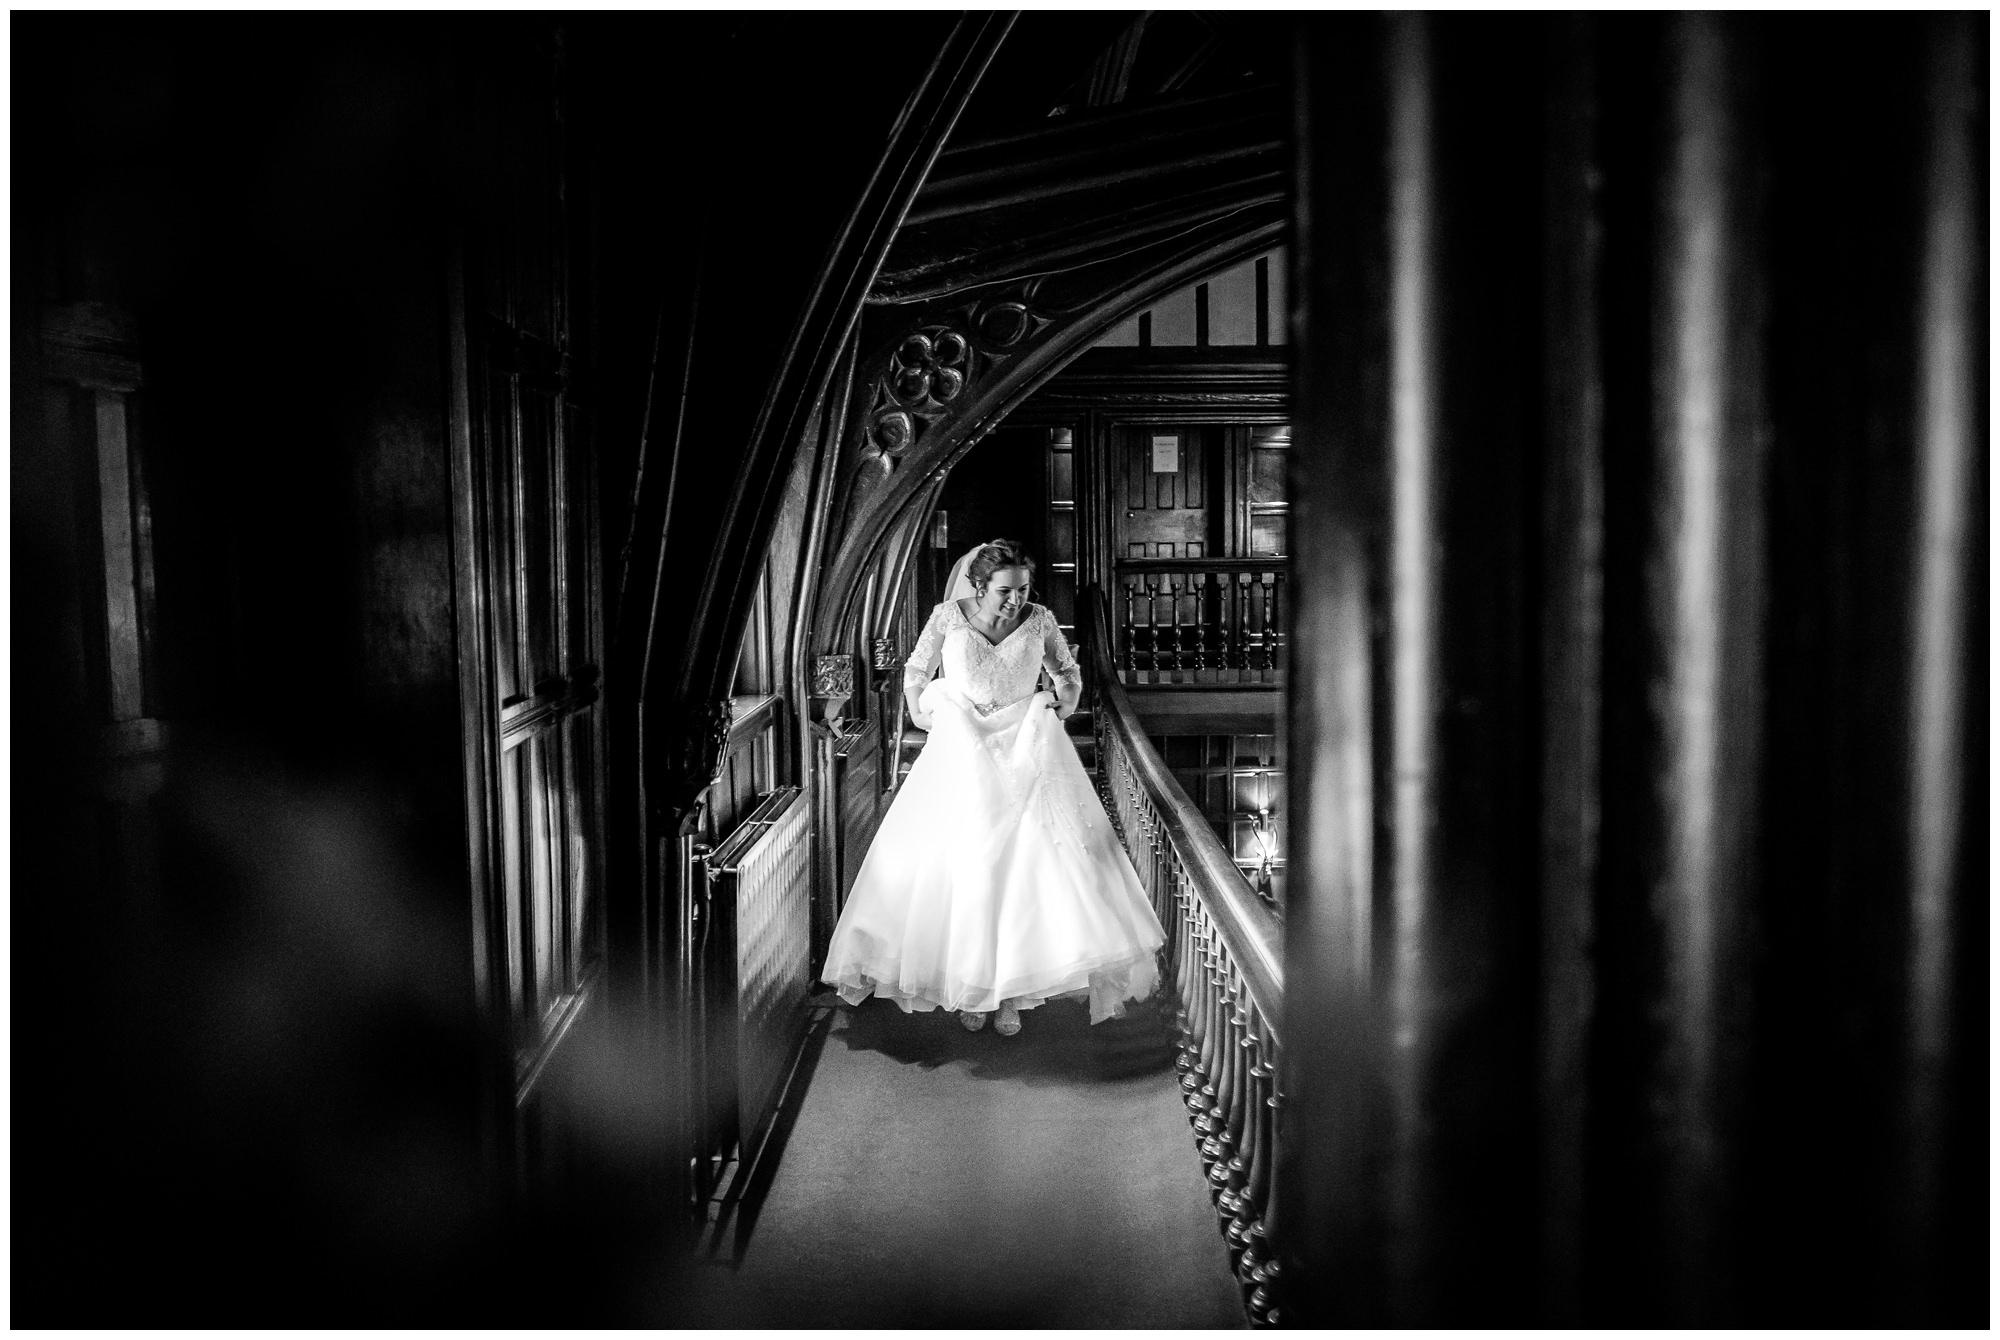 mitton-hall-wedding-photographer_0004.jpg